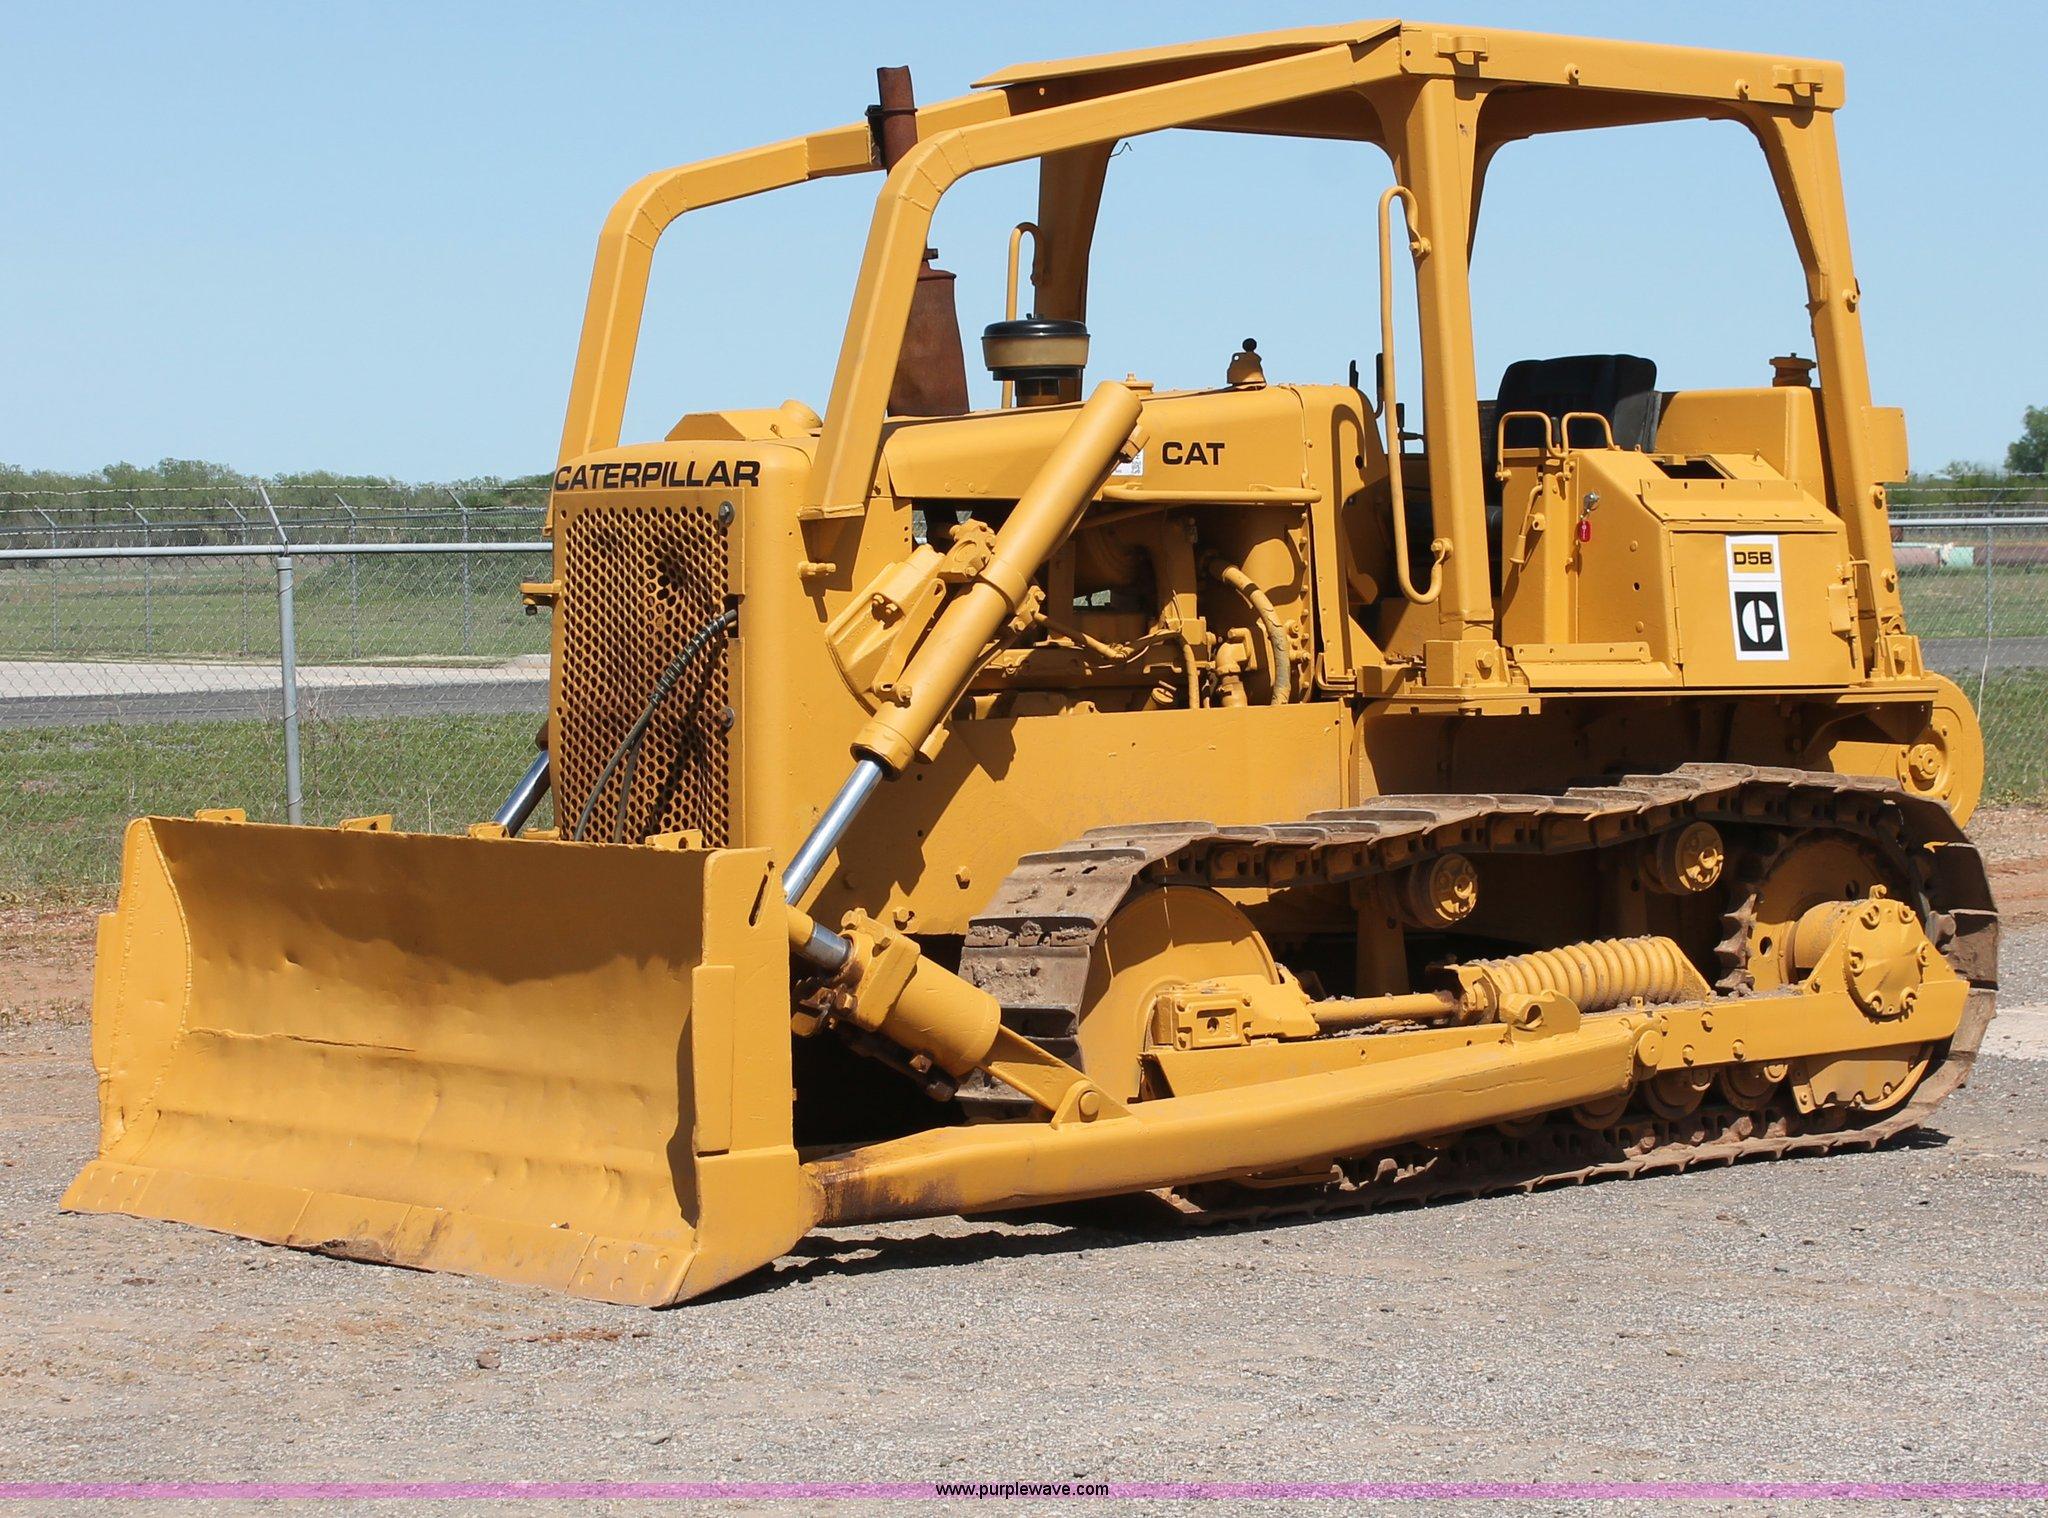 1978 Caterpillar D5B dozer | Item H5692 | SOLD! May 29 Const